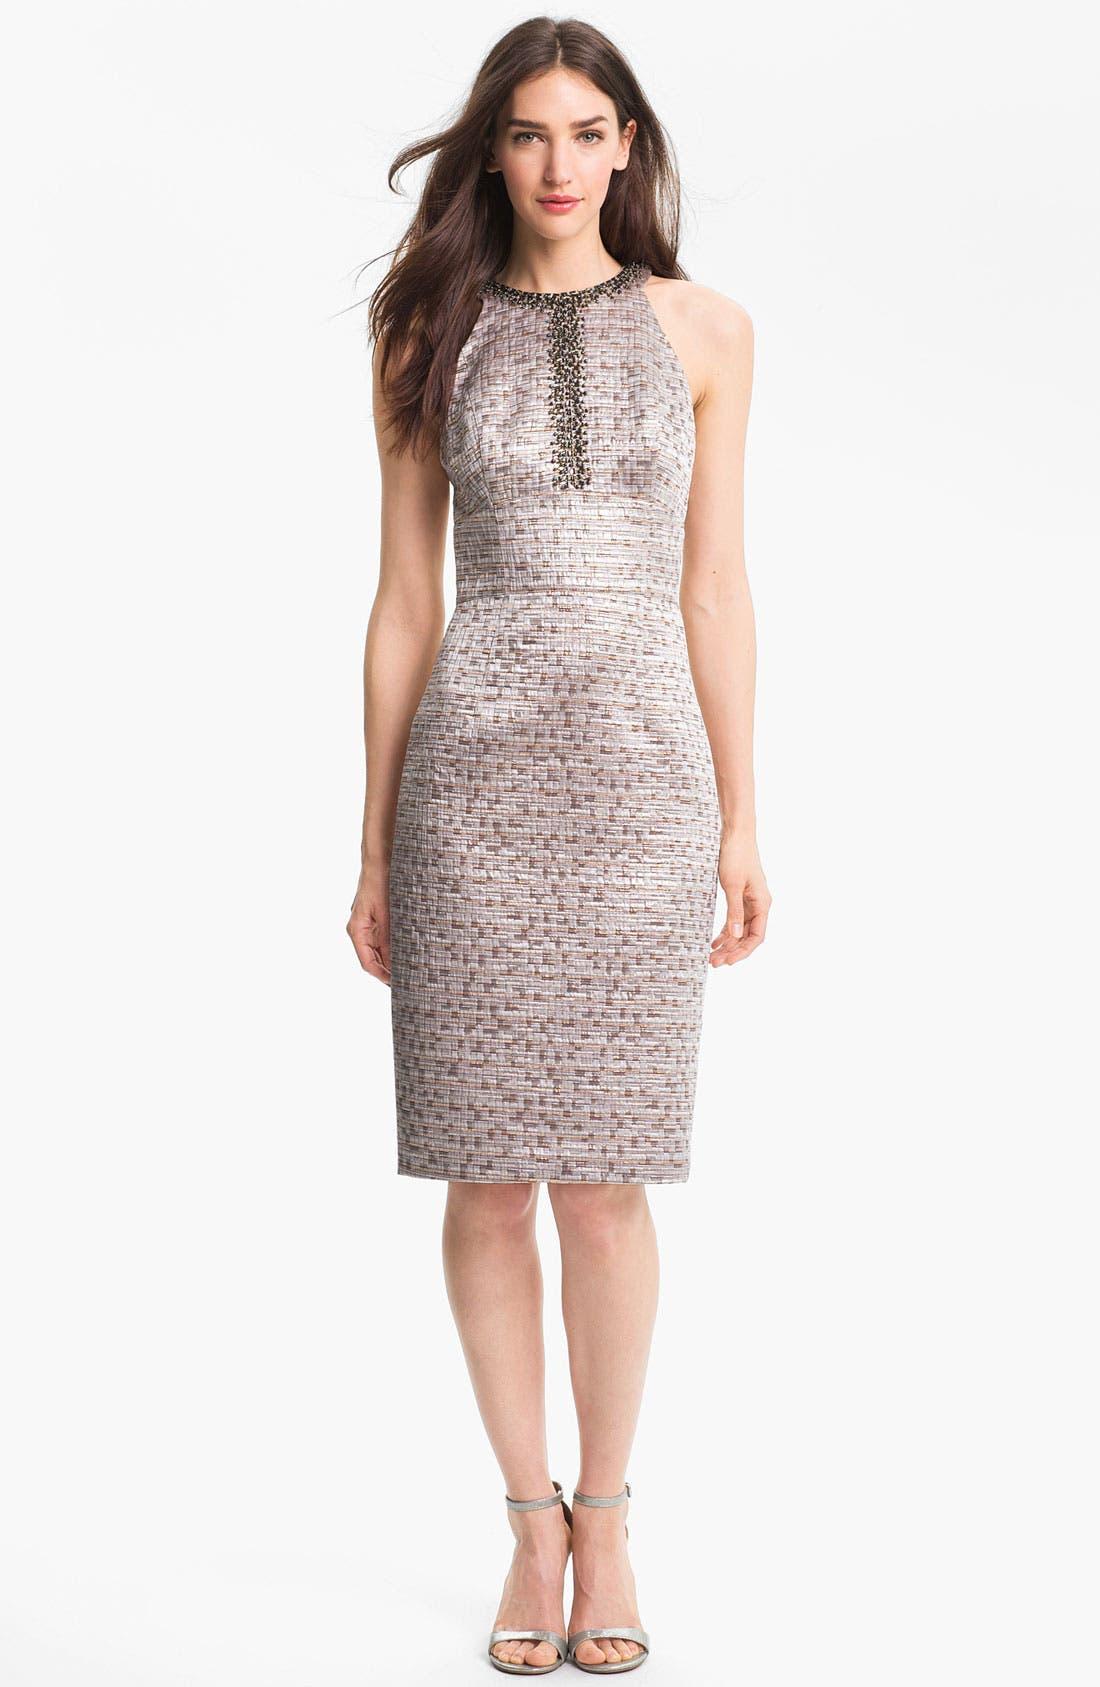 Alternate Image 1 Selected - Maggy London Embellished Brocade Sheath Dress